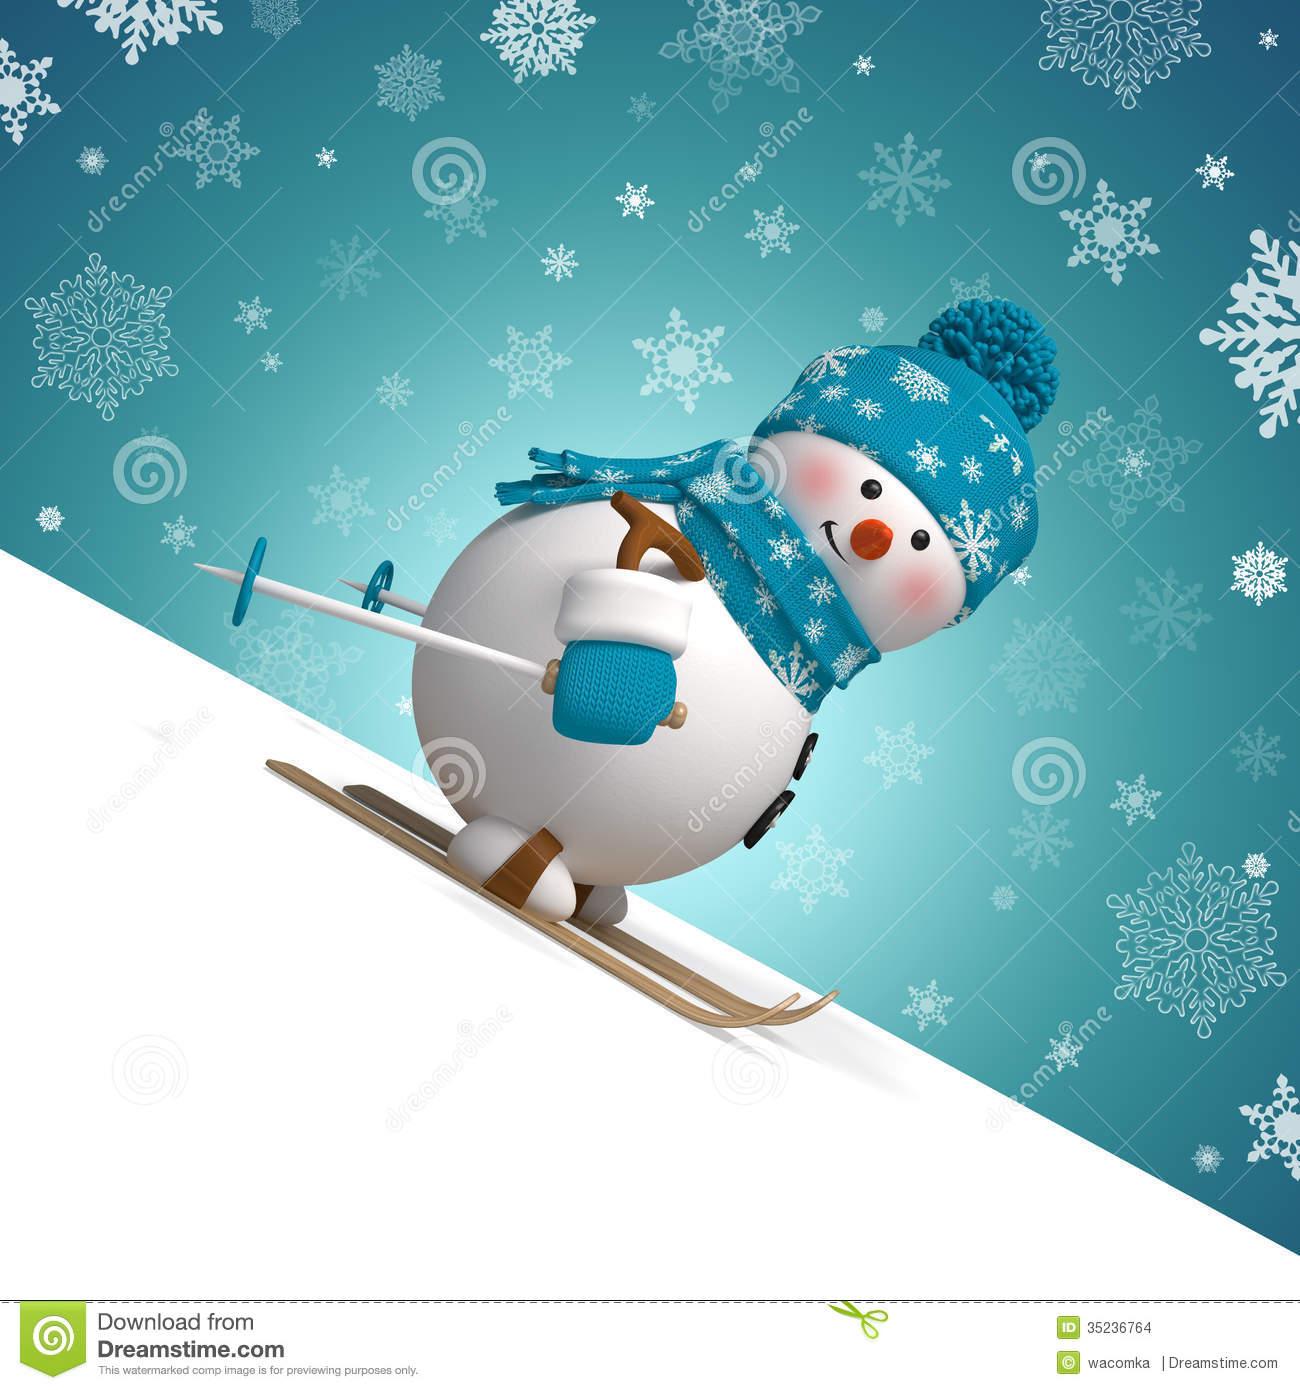 Carte de noel avec bonhomme de neige